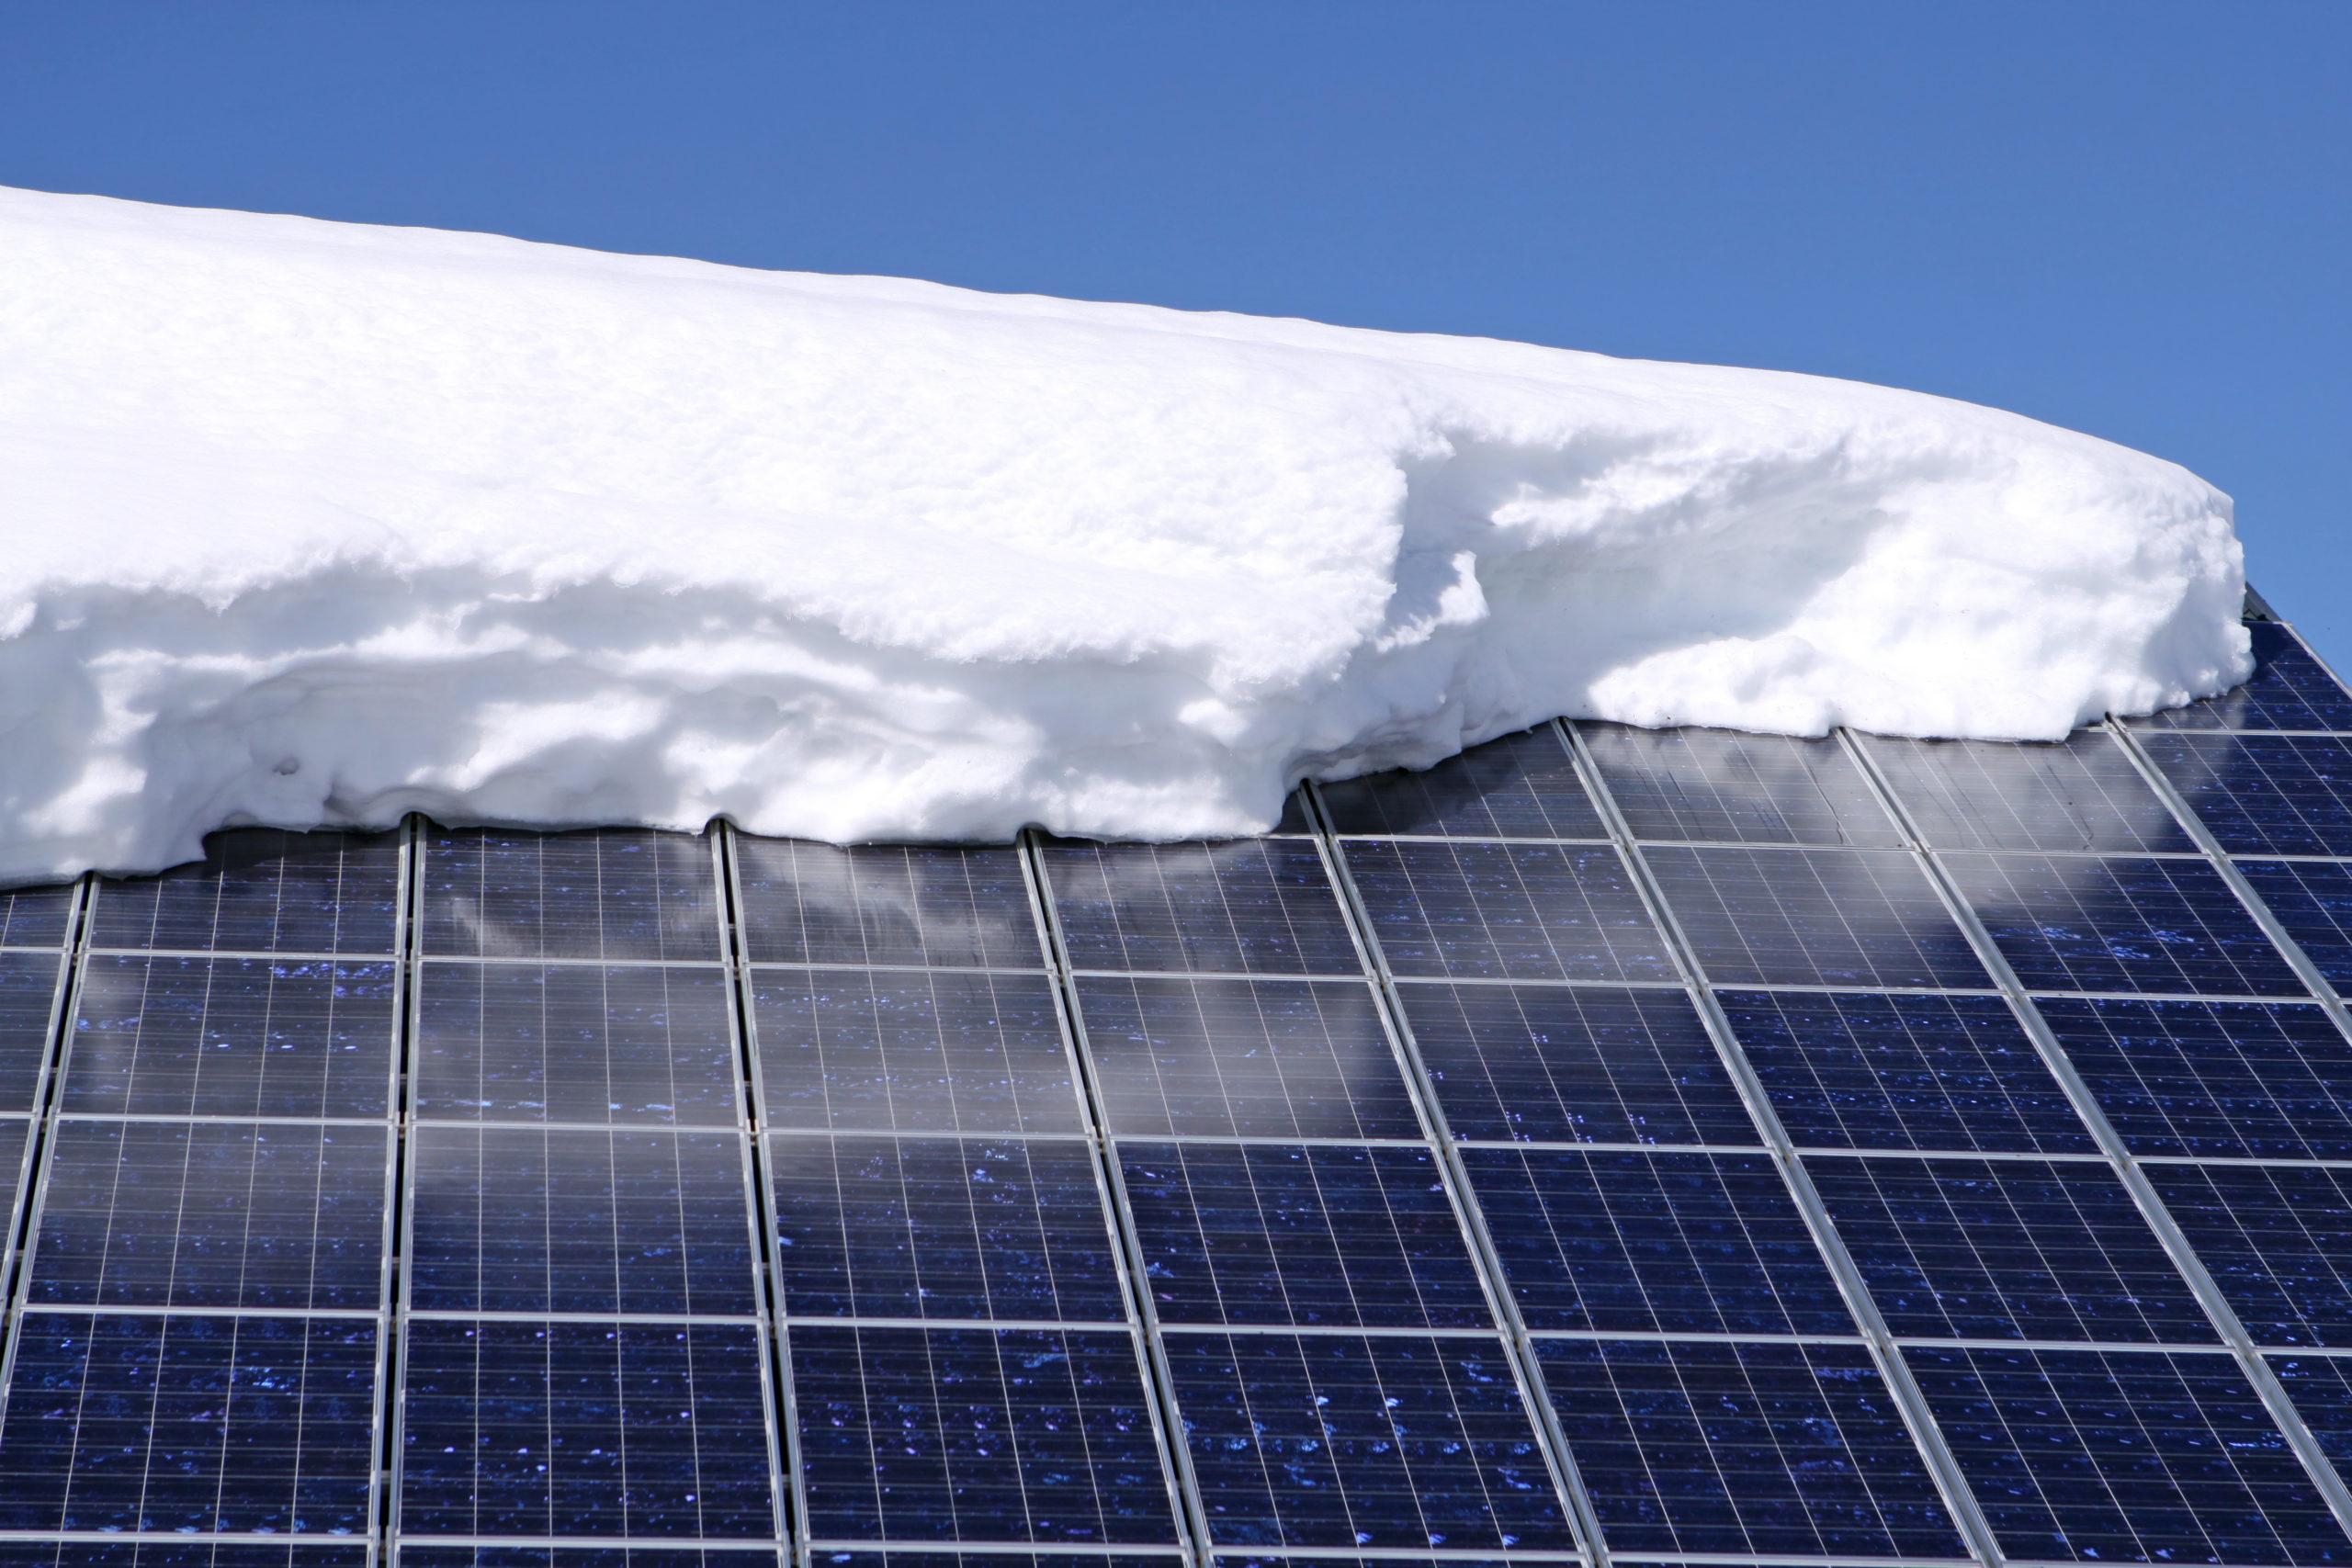 solar panels with snow